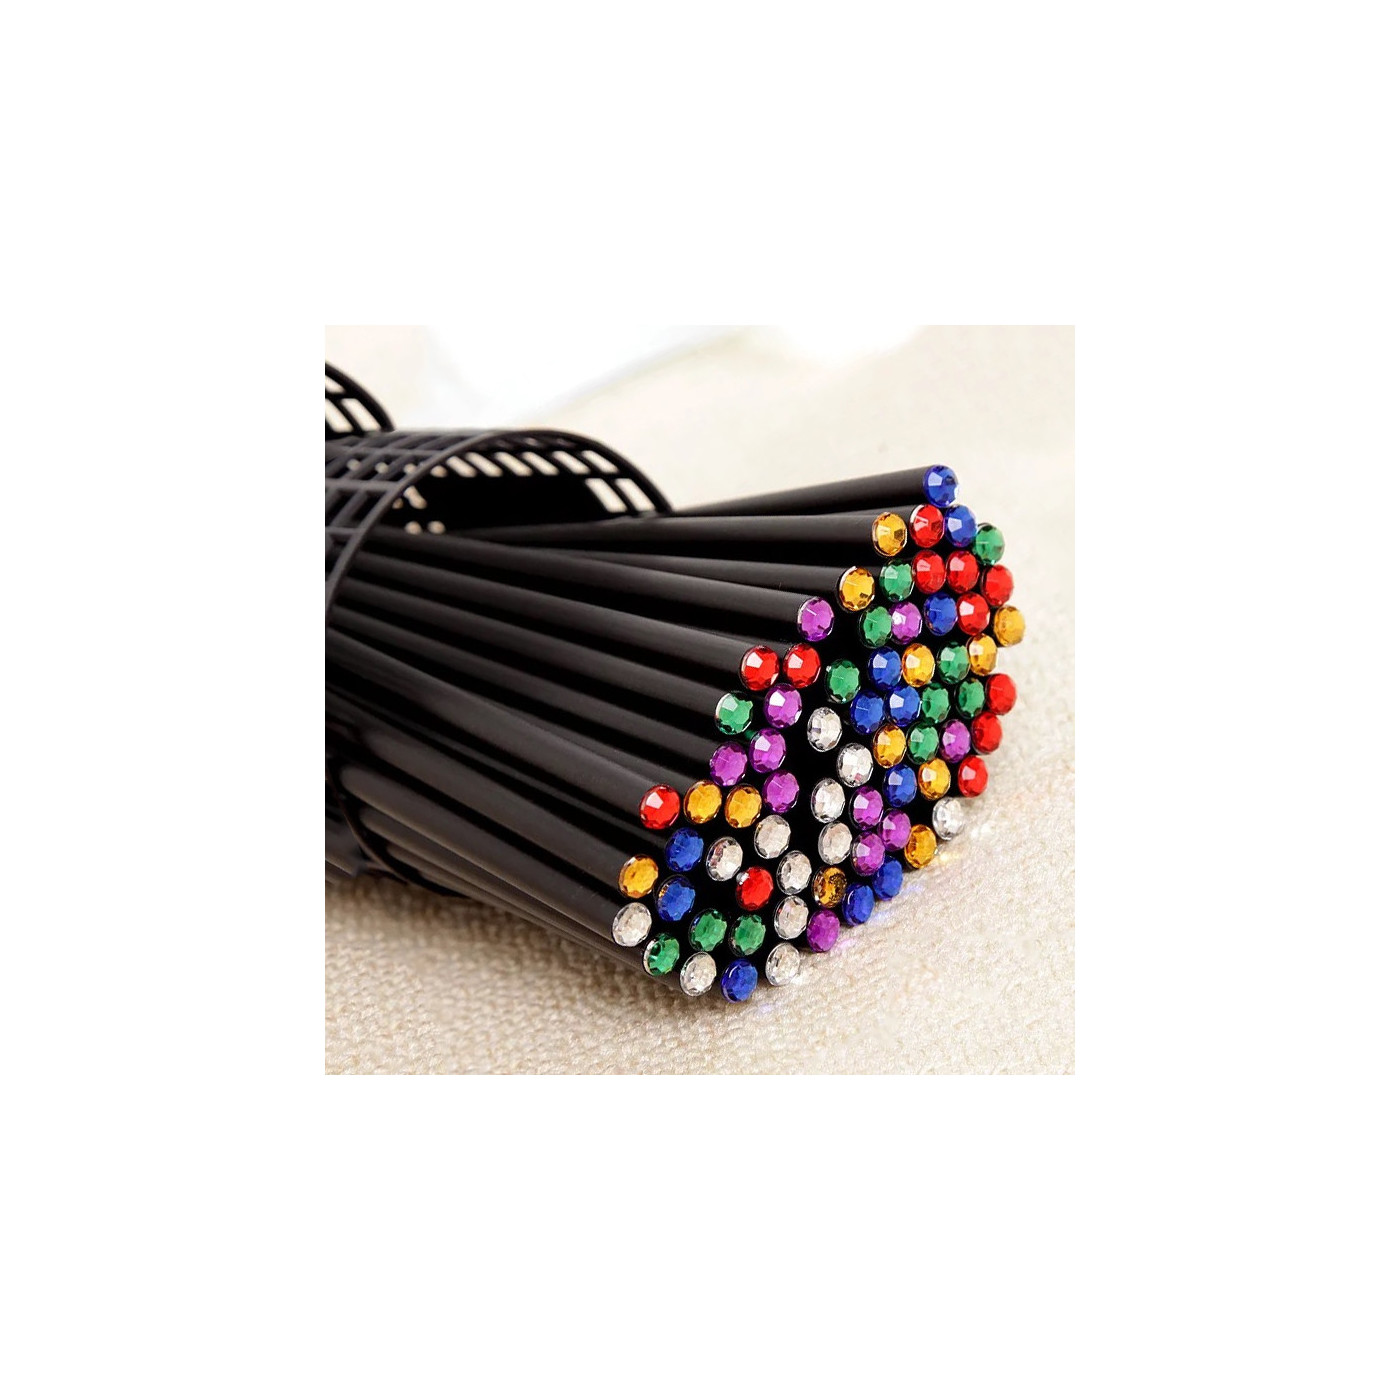 Set of 40 black wooden pencils with diamond